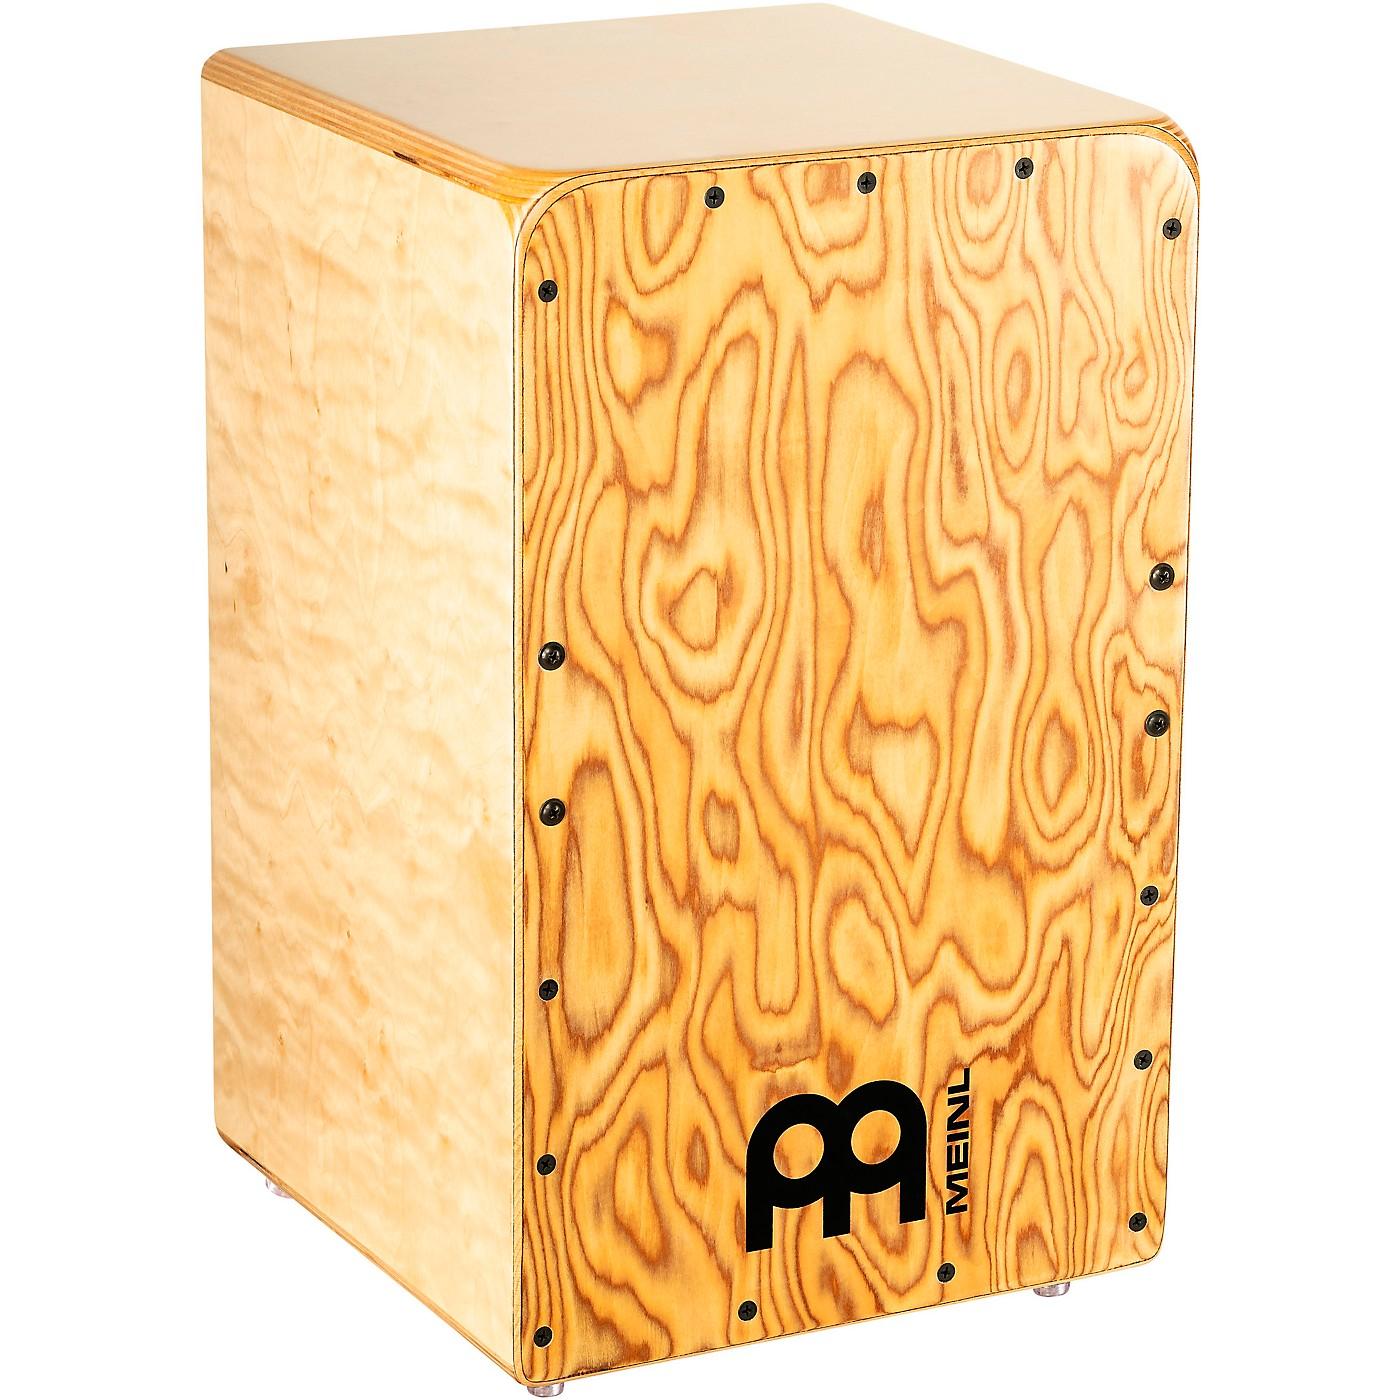 MEINL Woodcraft Series String Cajon with Makah Burl Frontplate thumbnail